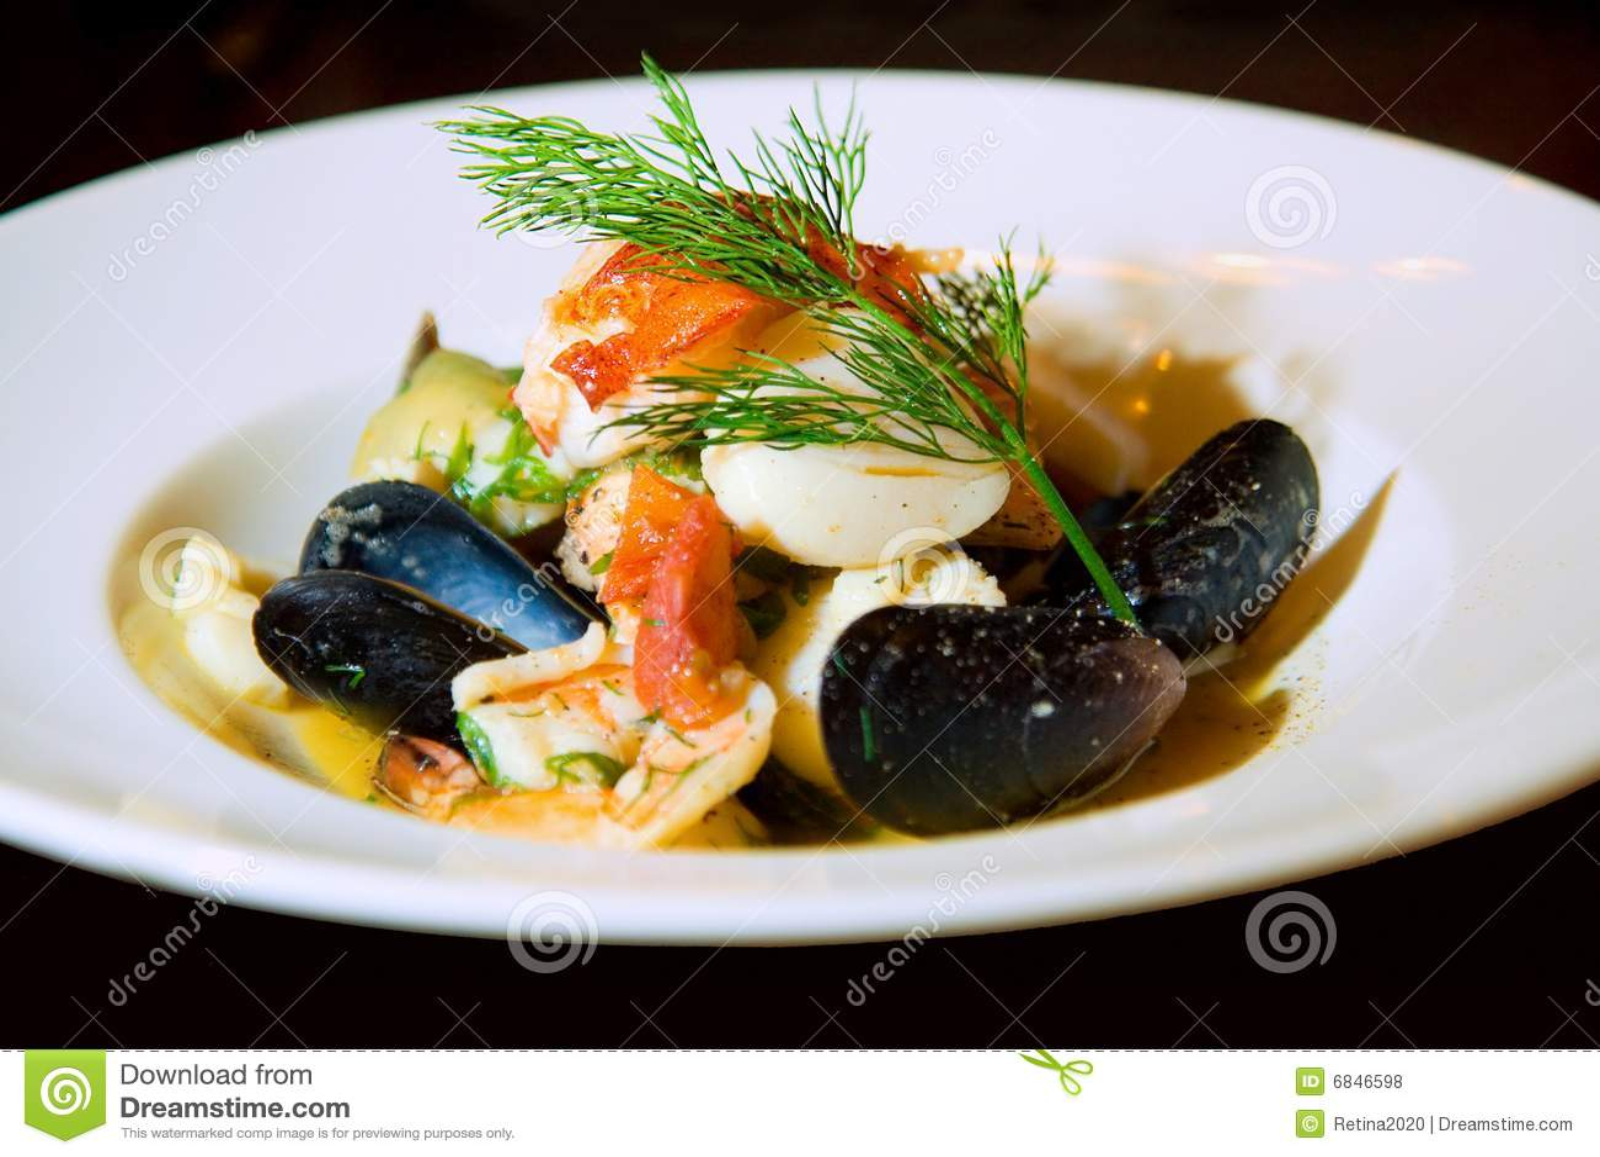 Seafood bouillabaisse or soup